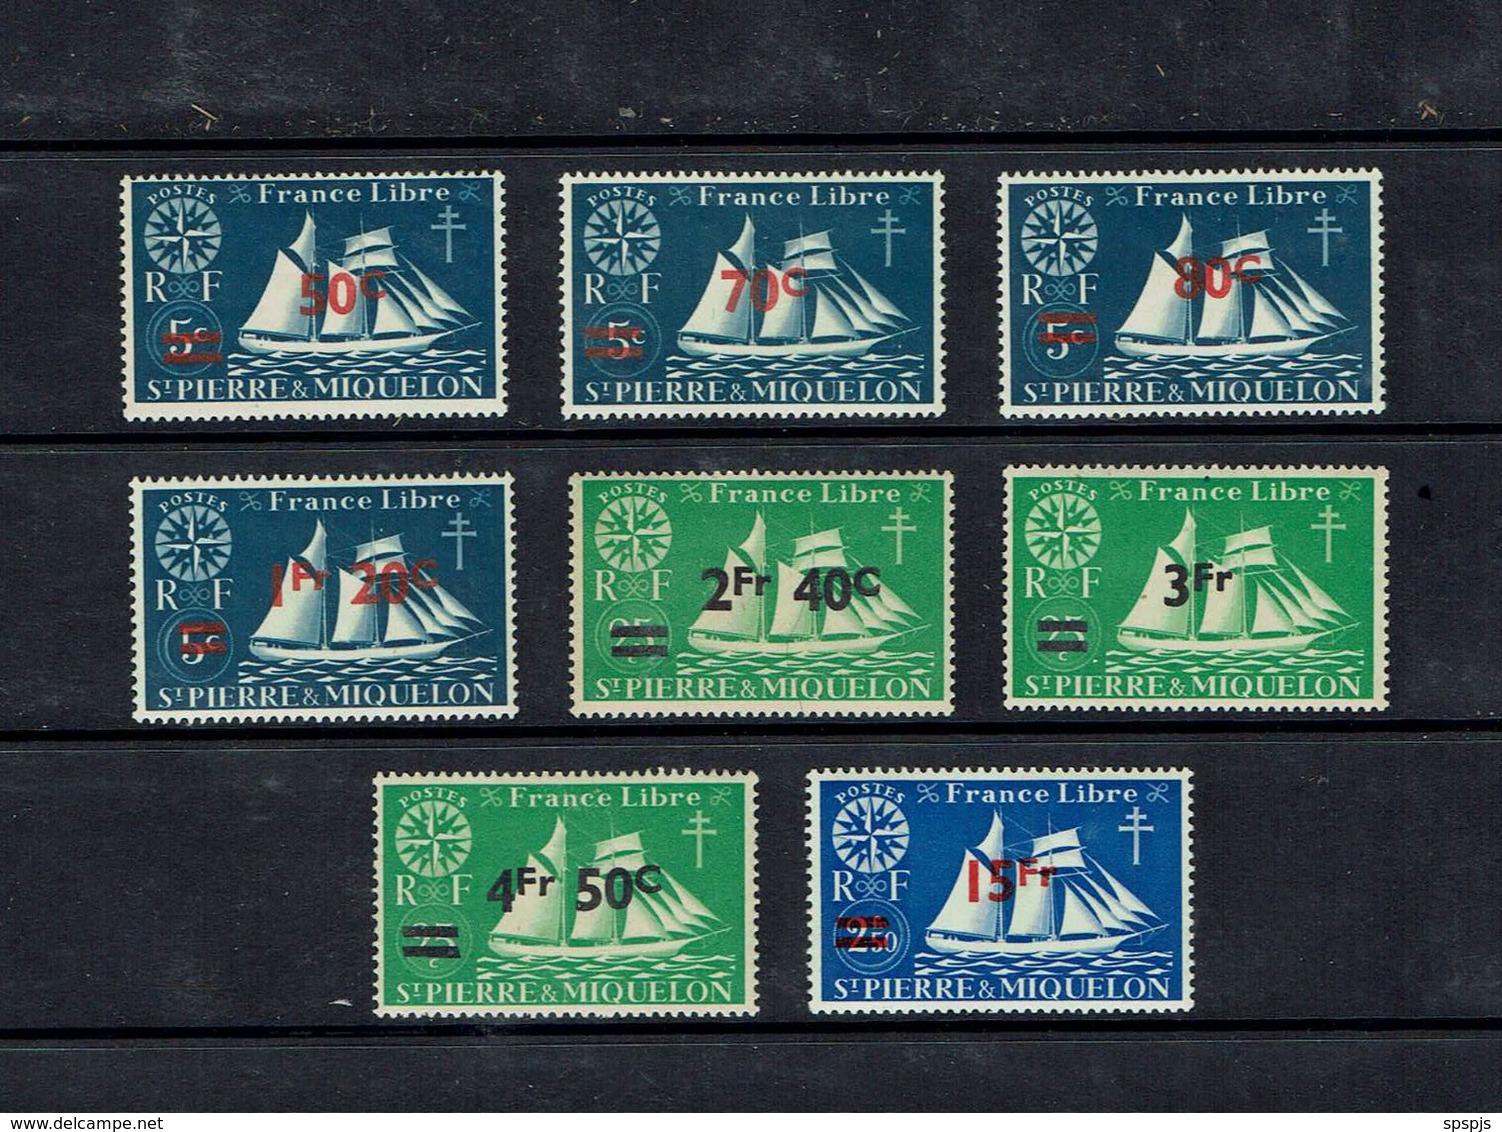 ST PIERRE & MIQUELON...1945...Scott #314-21 - Used Stamps